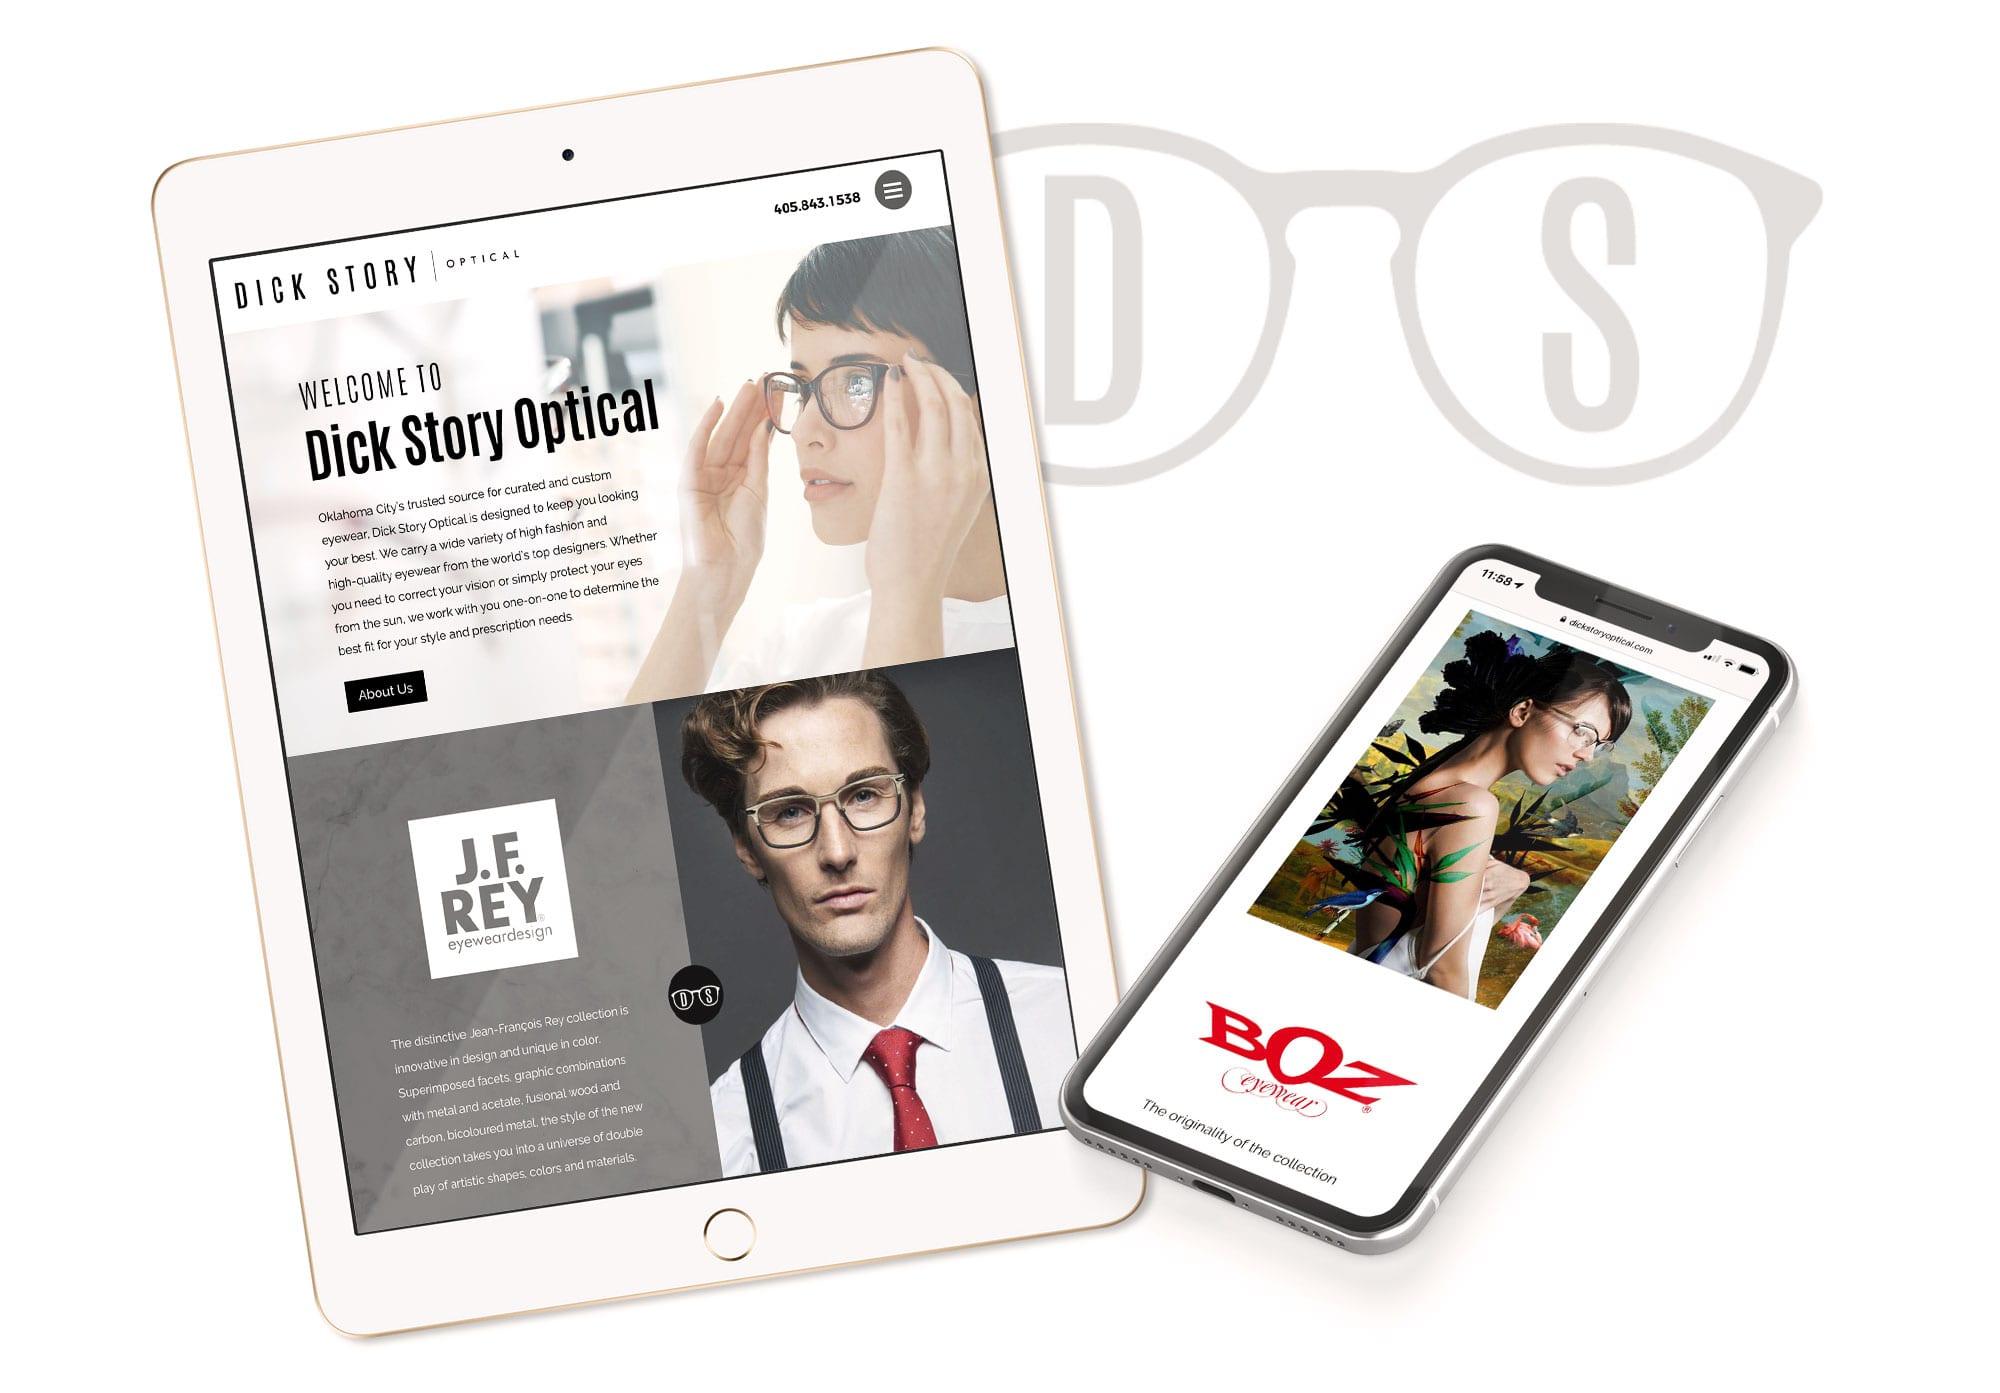 Dick Story Optical Website Design & Development by Liquid Media